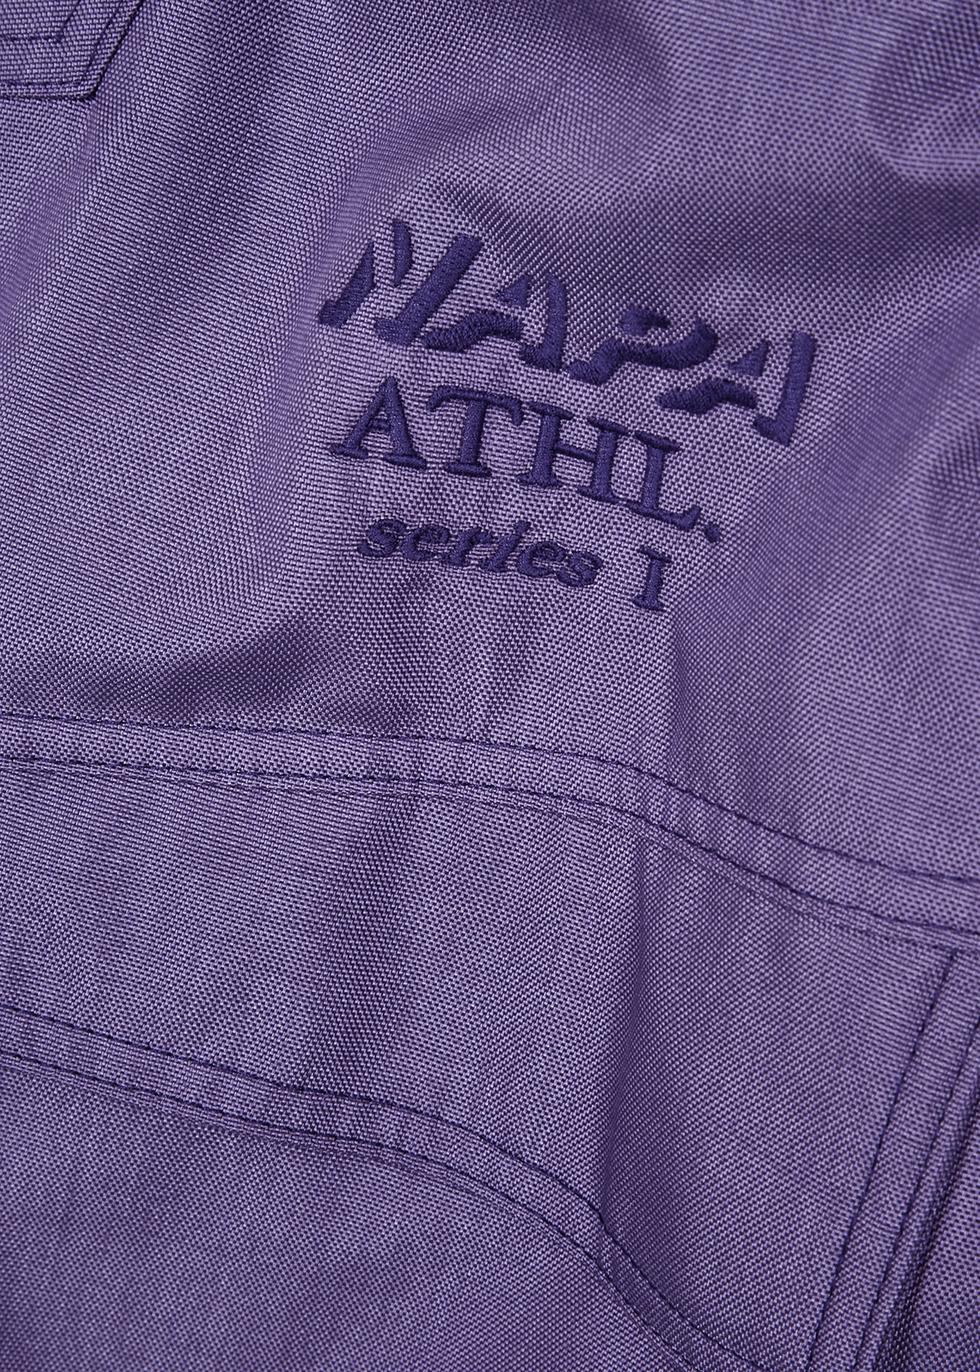 Allos purple canvas jacket - Napa by Martine Rose